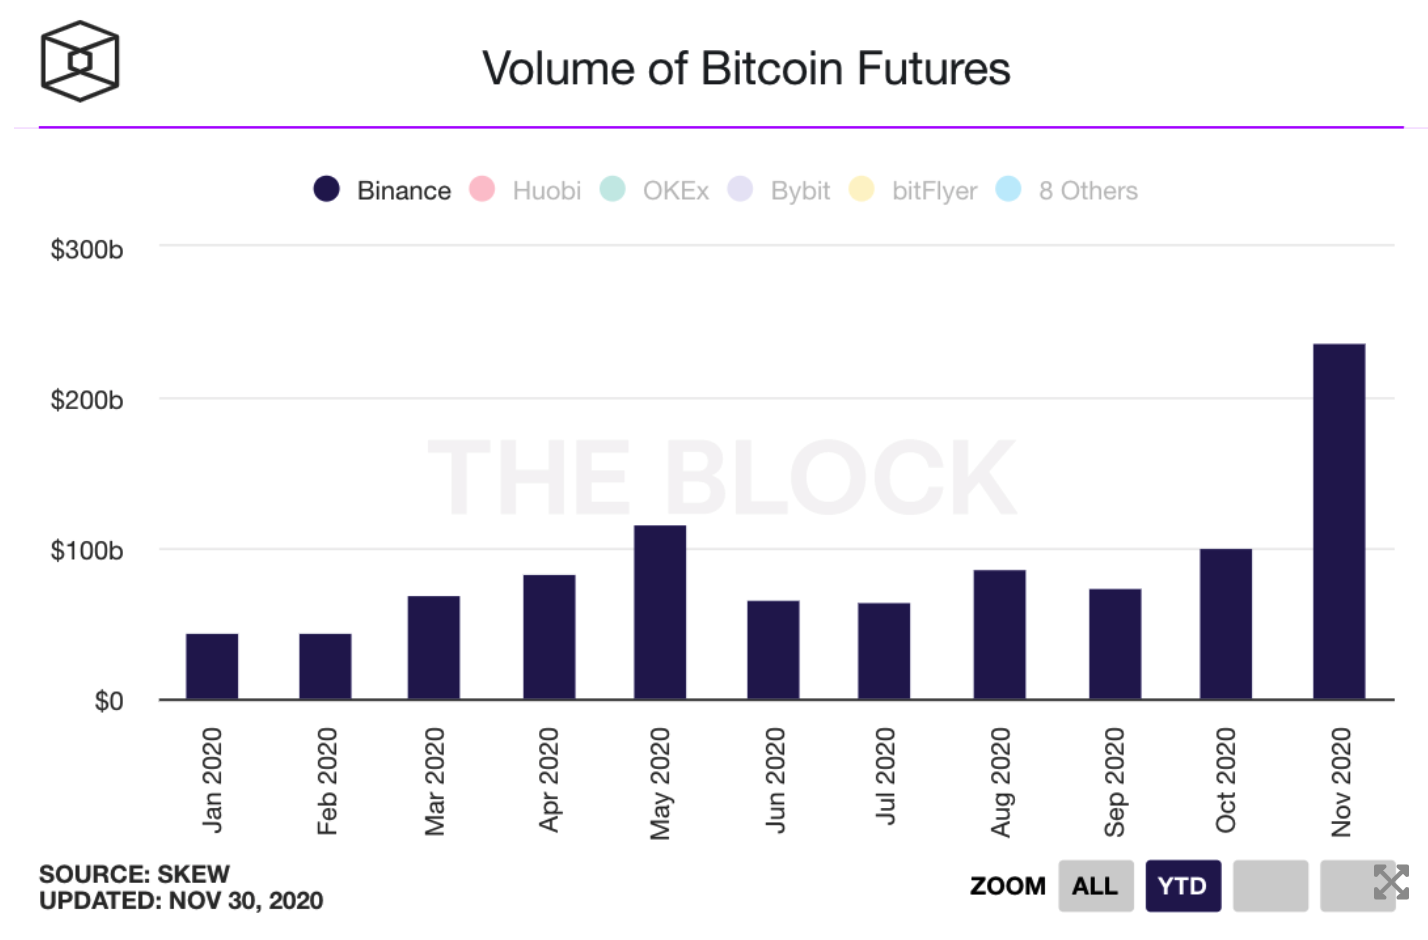 Bitcoin futures binance transaction volume